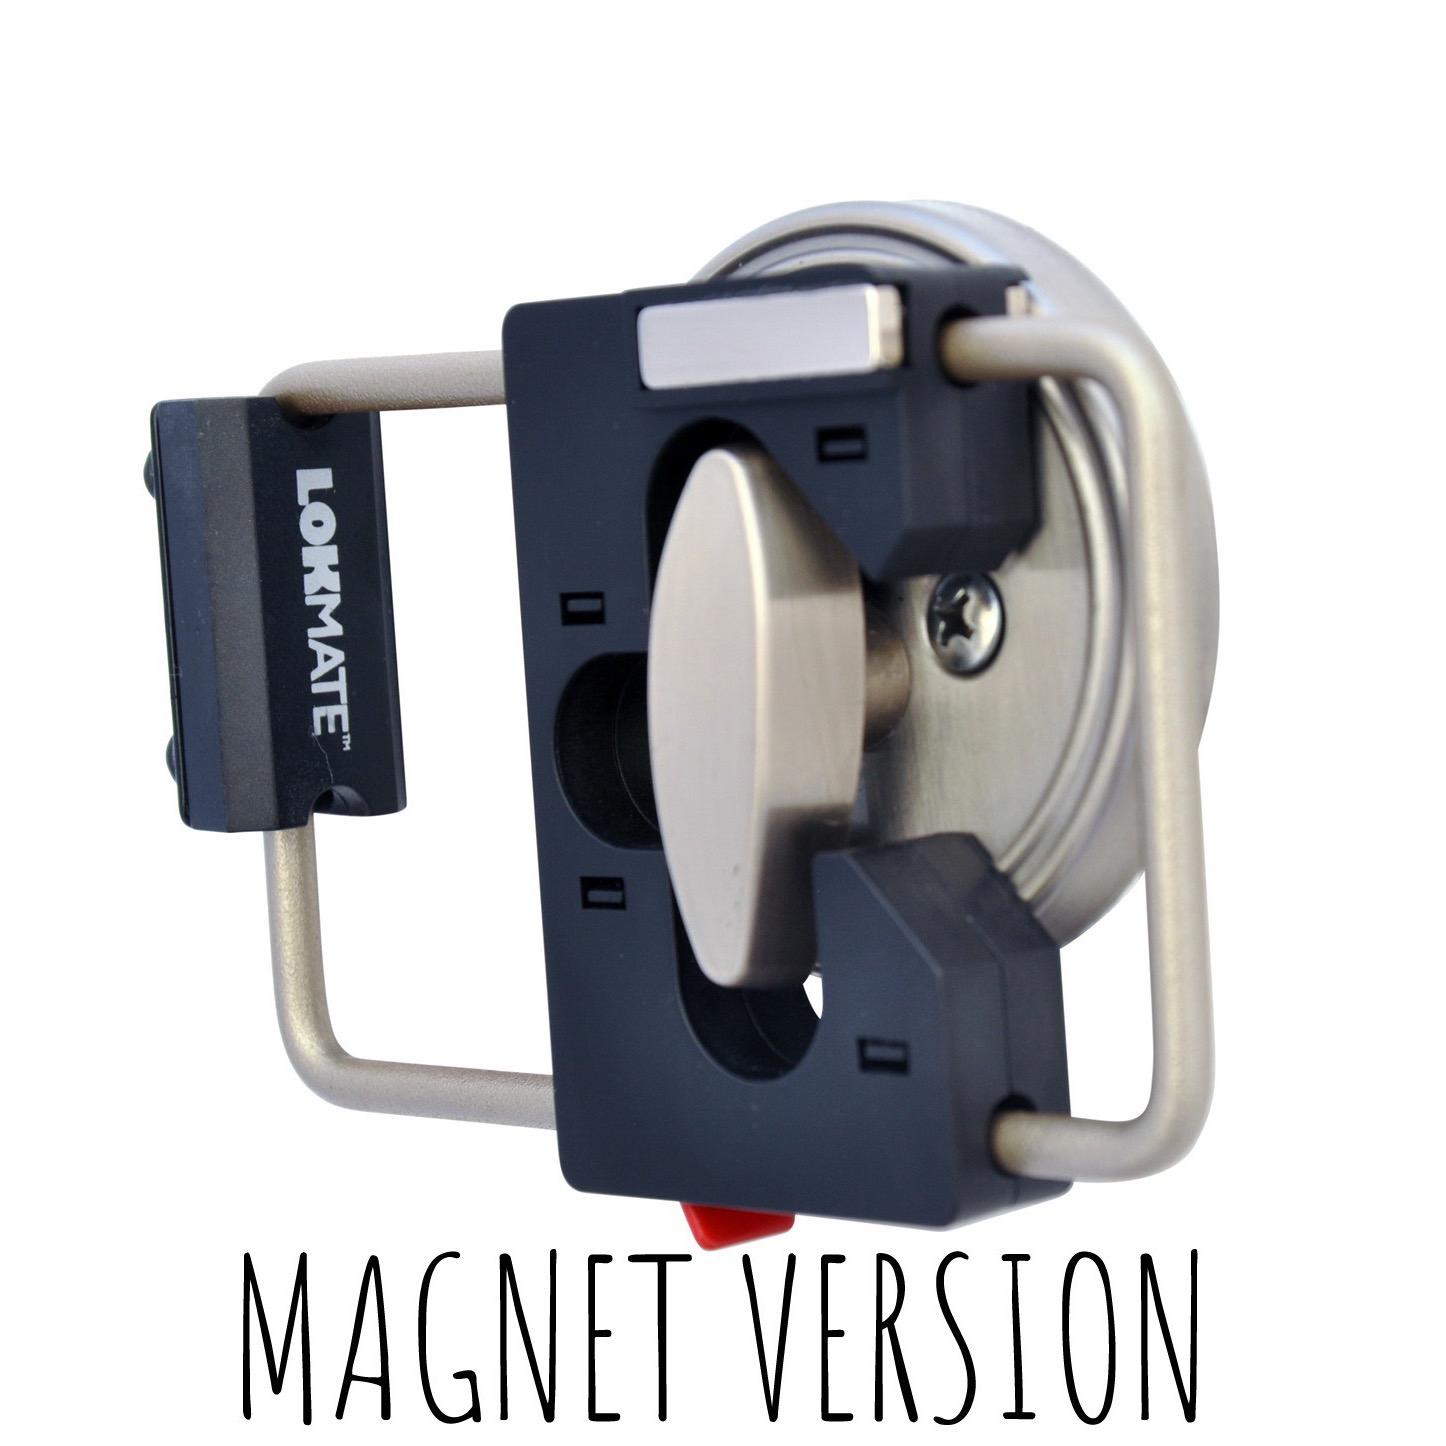 LOKMate Portable Deadbolt Guard Door Lock New Magnet Version Rose Gold // White